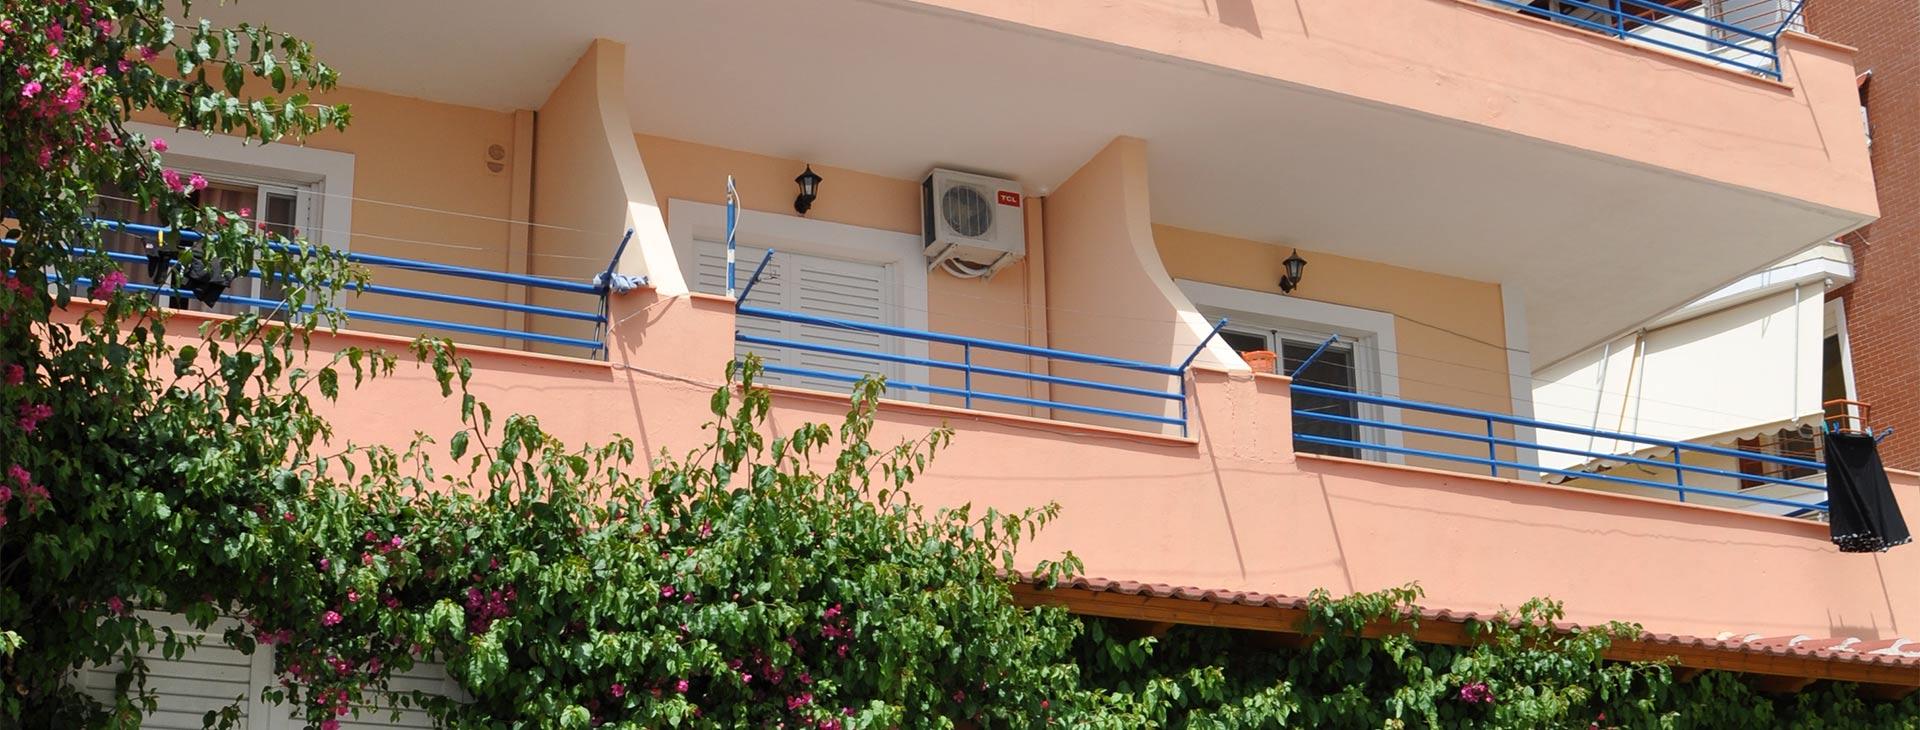 Hotel alvin apartamenty wybrze e jo skie albania for Appart hotel saran